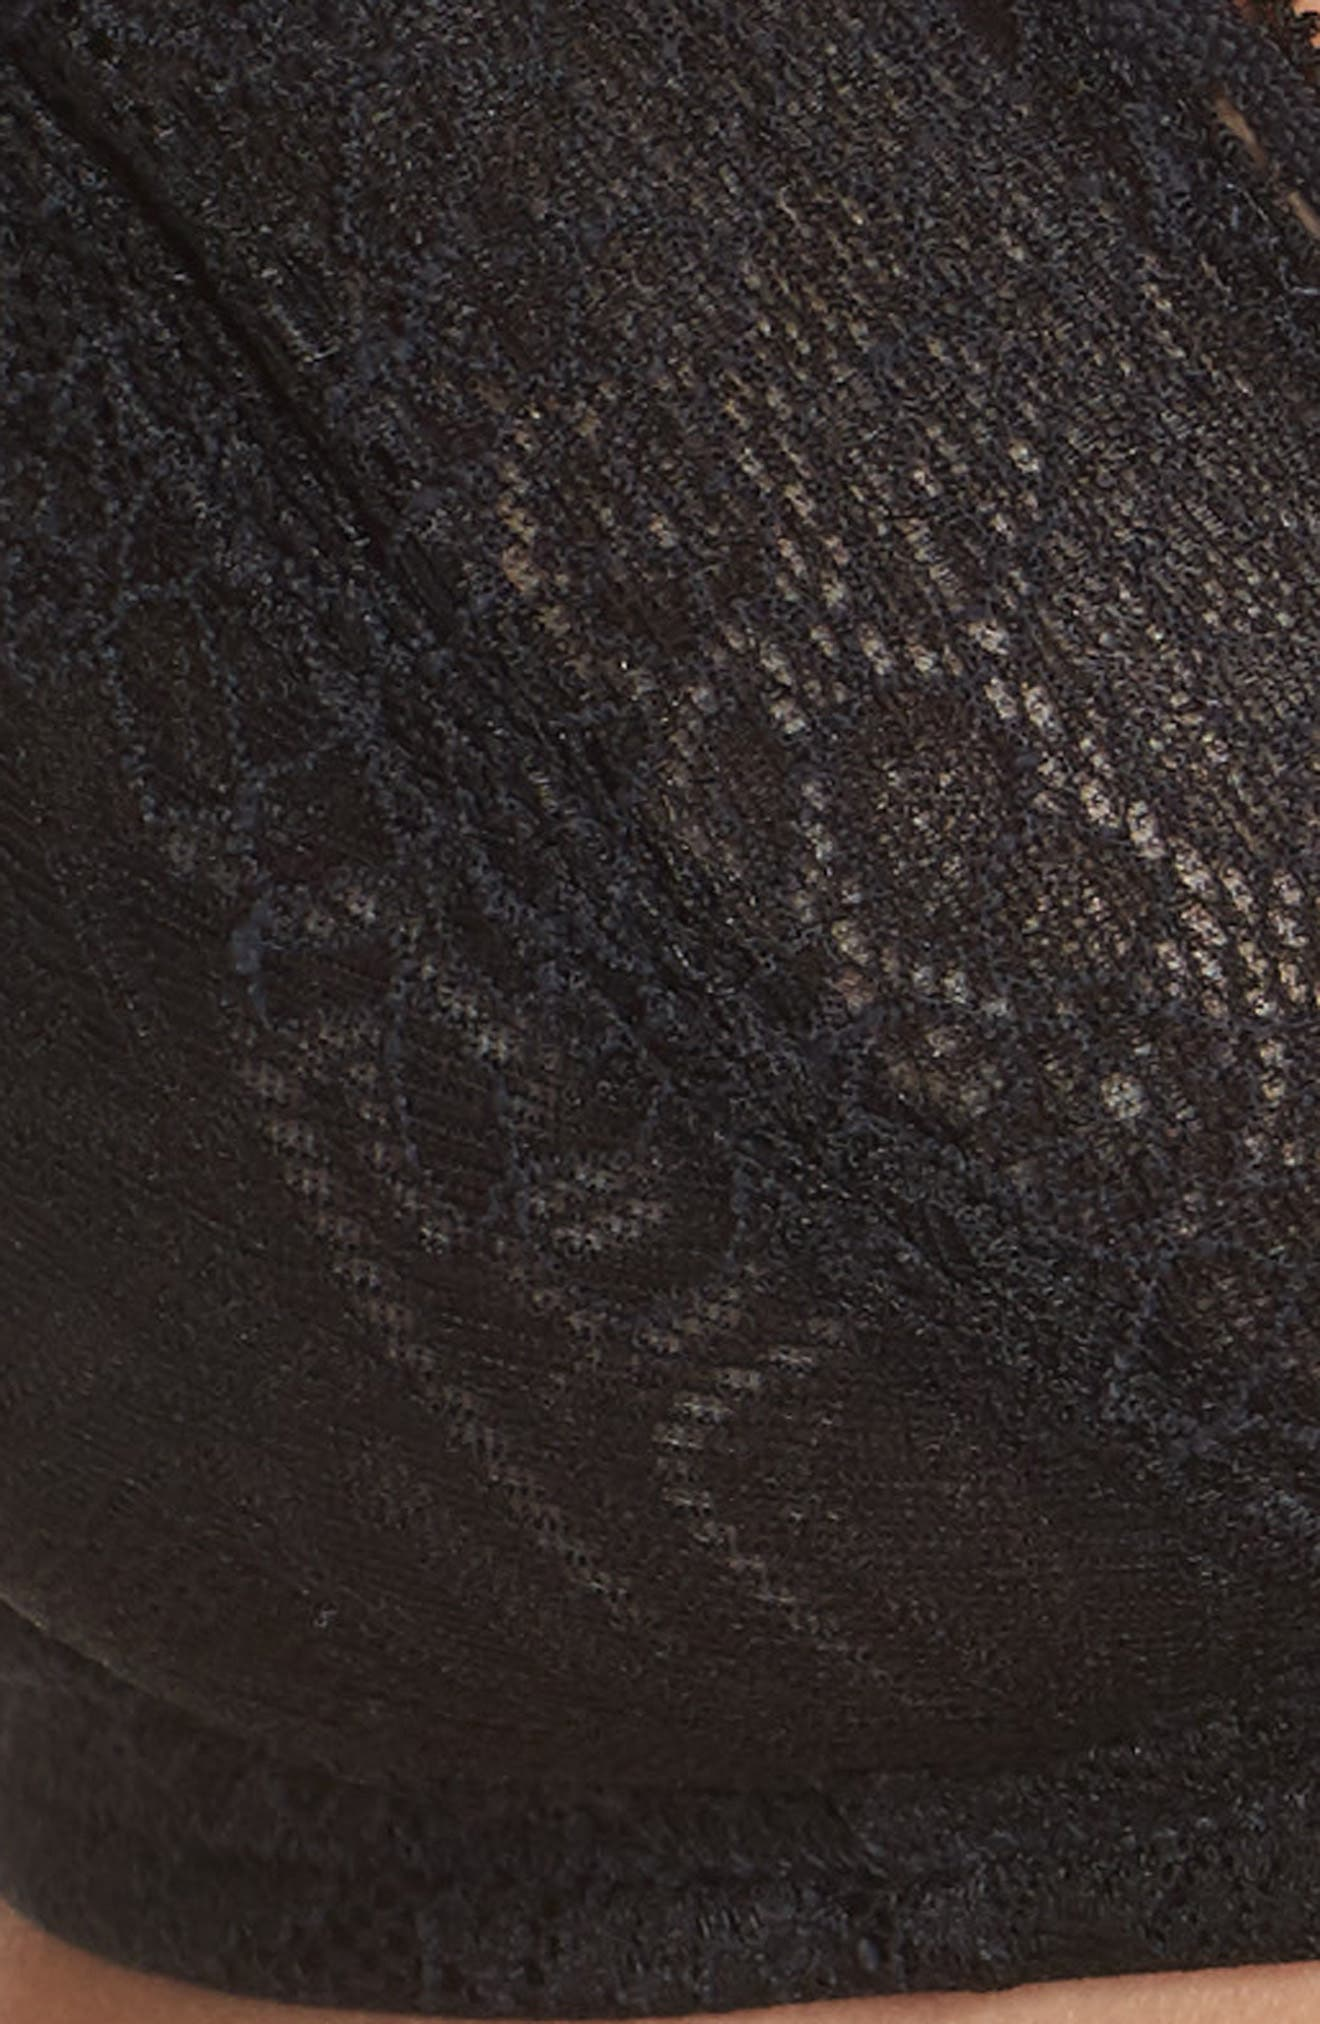 MADEWELL, Lace Bralette, Alternate thumbnail 8, color, TRUE BLACK